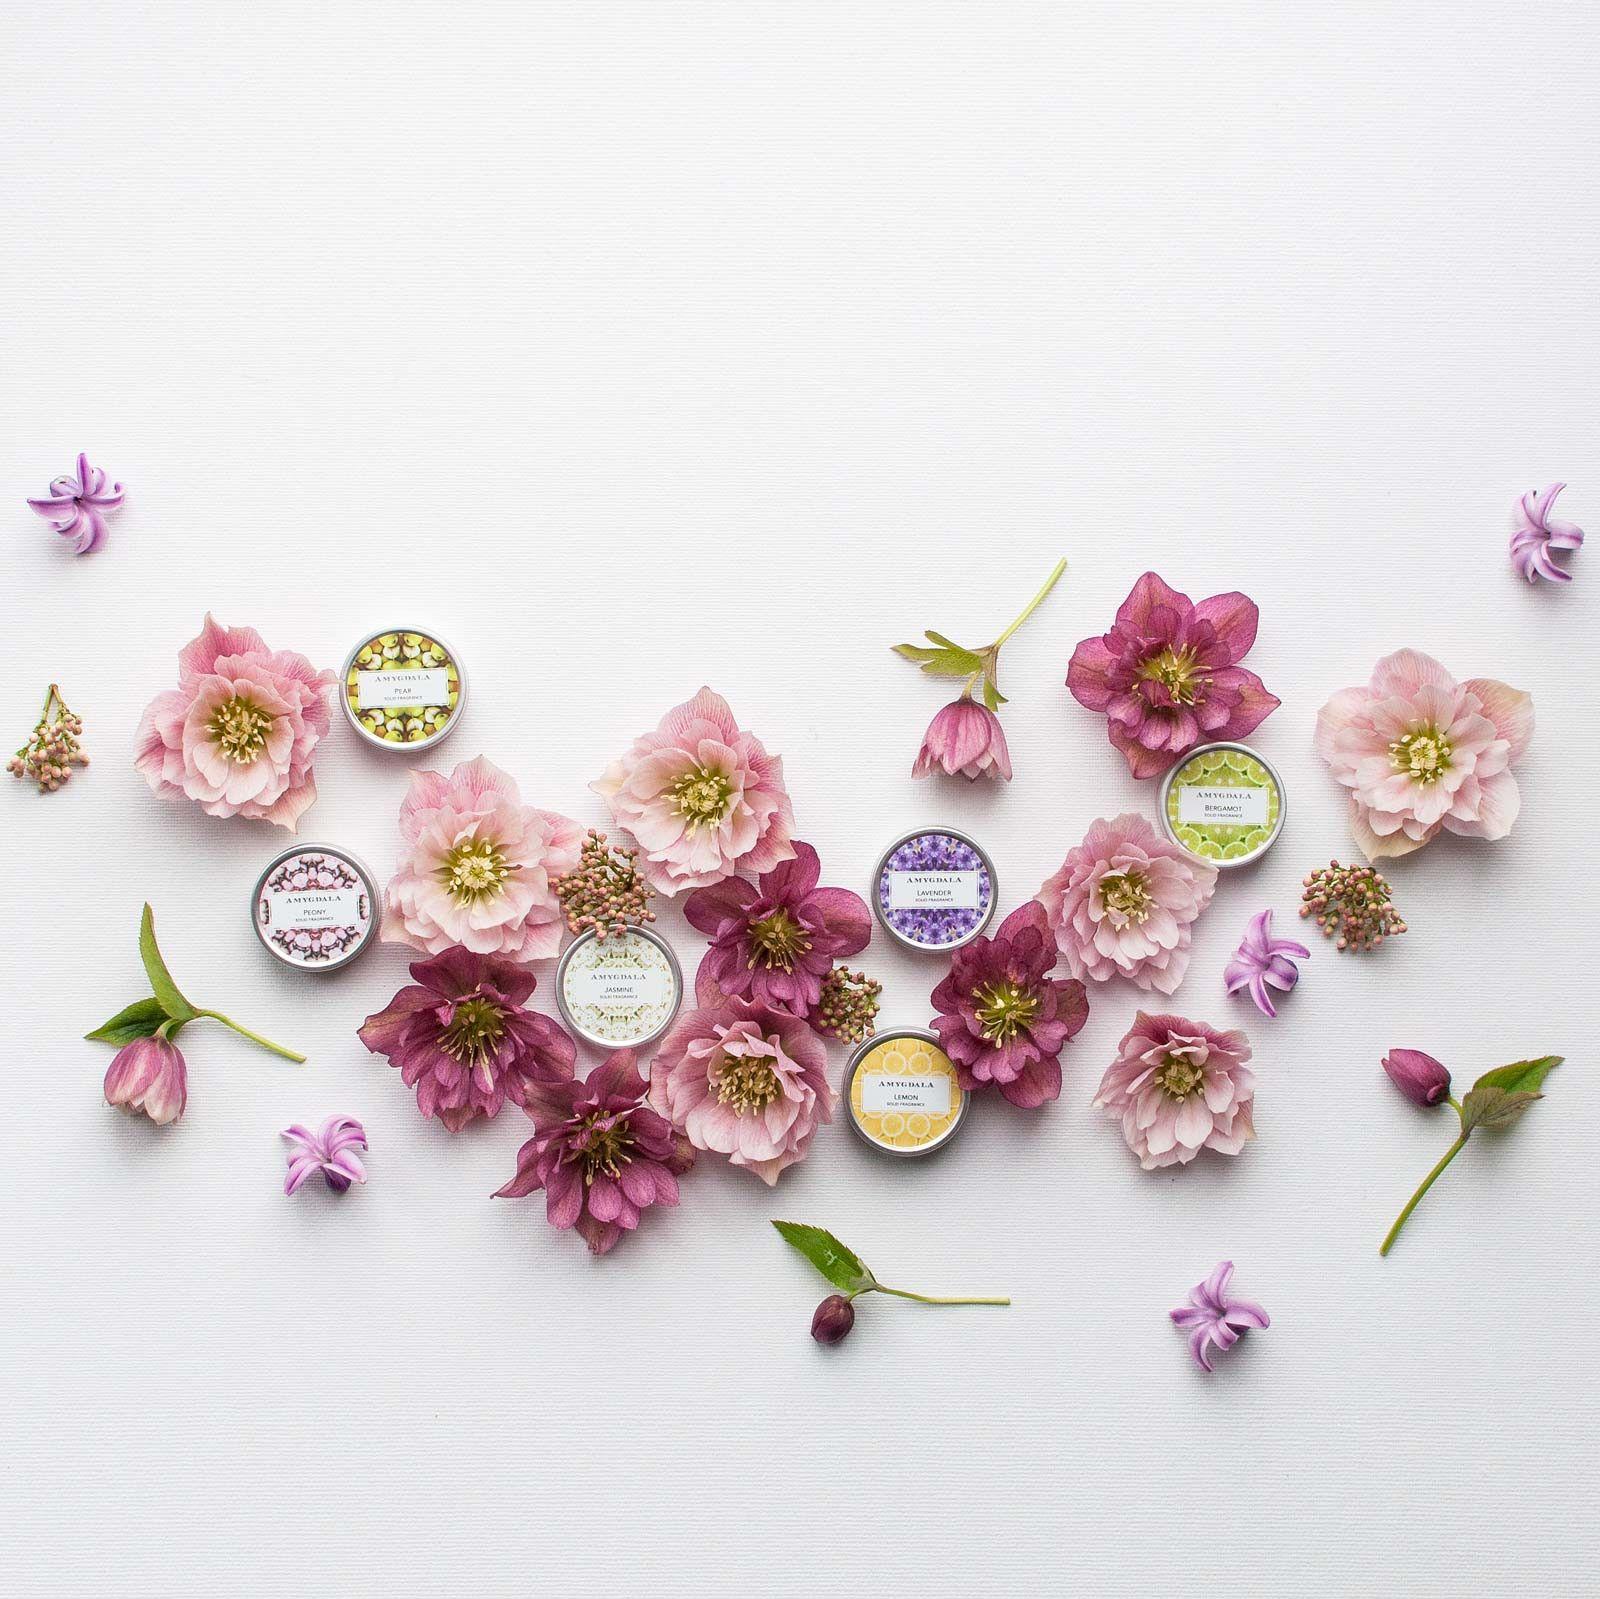 Solid perfumes spring flowers amygdala fragrances pinterest amygdala blend and customise your fragrance solid perfumes spring flowers mightylinksfo